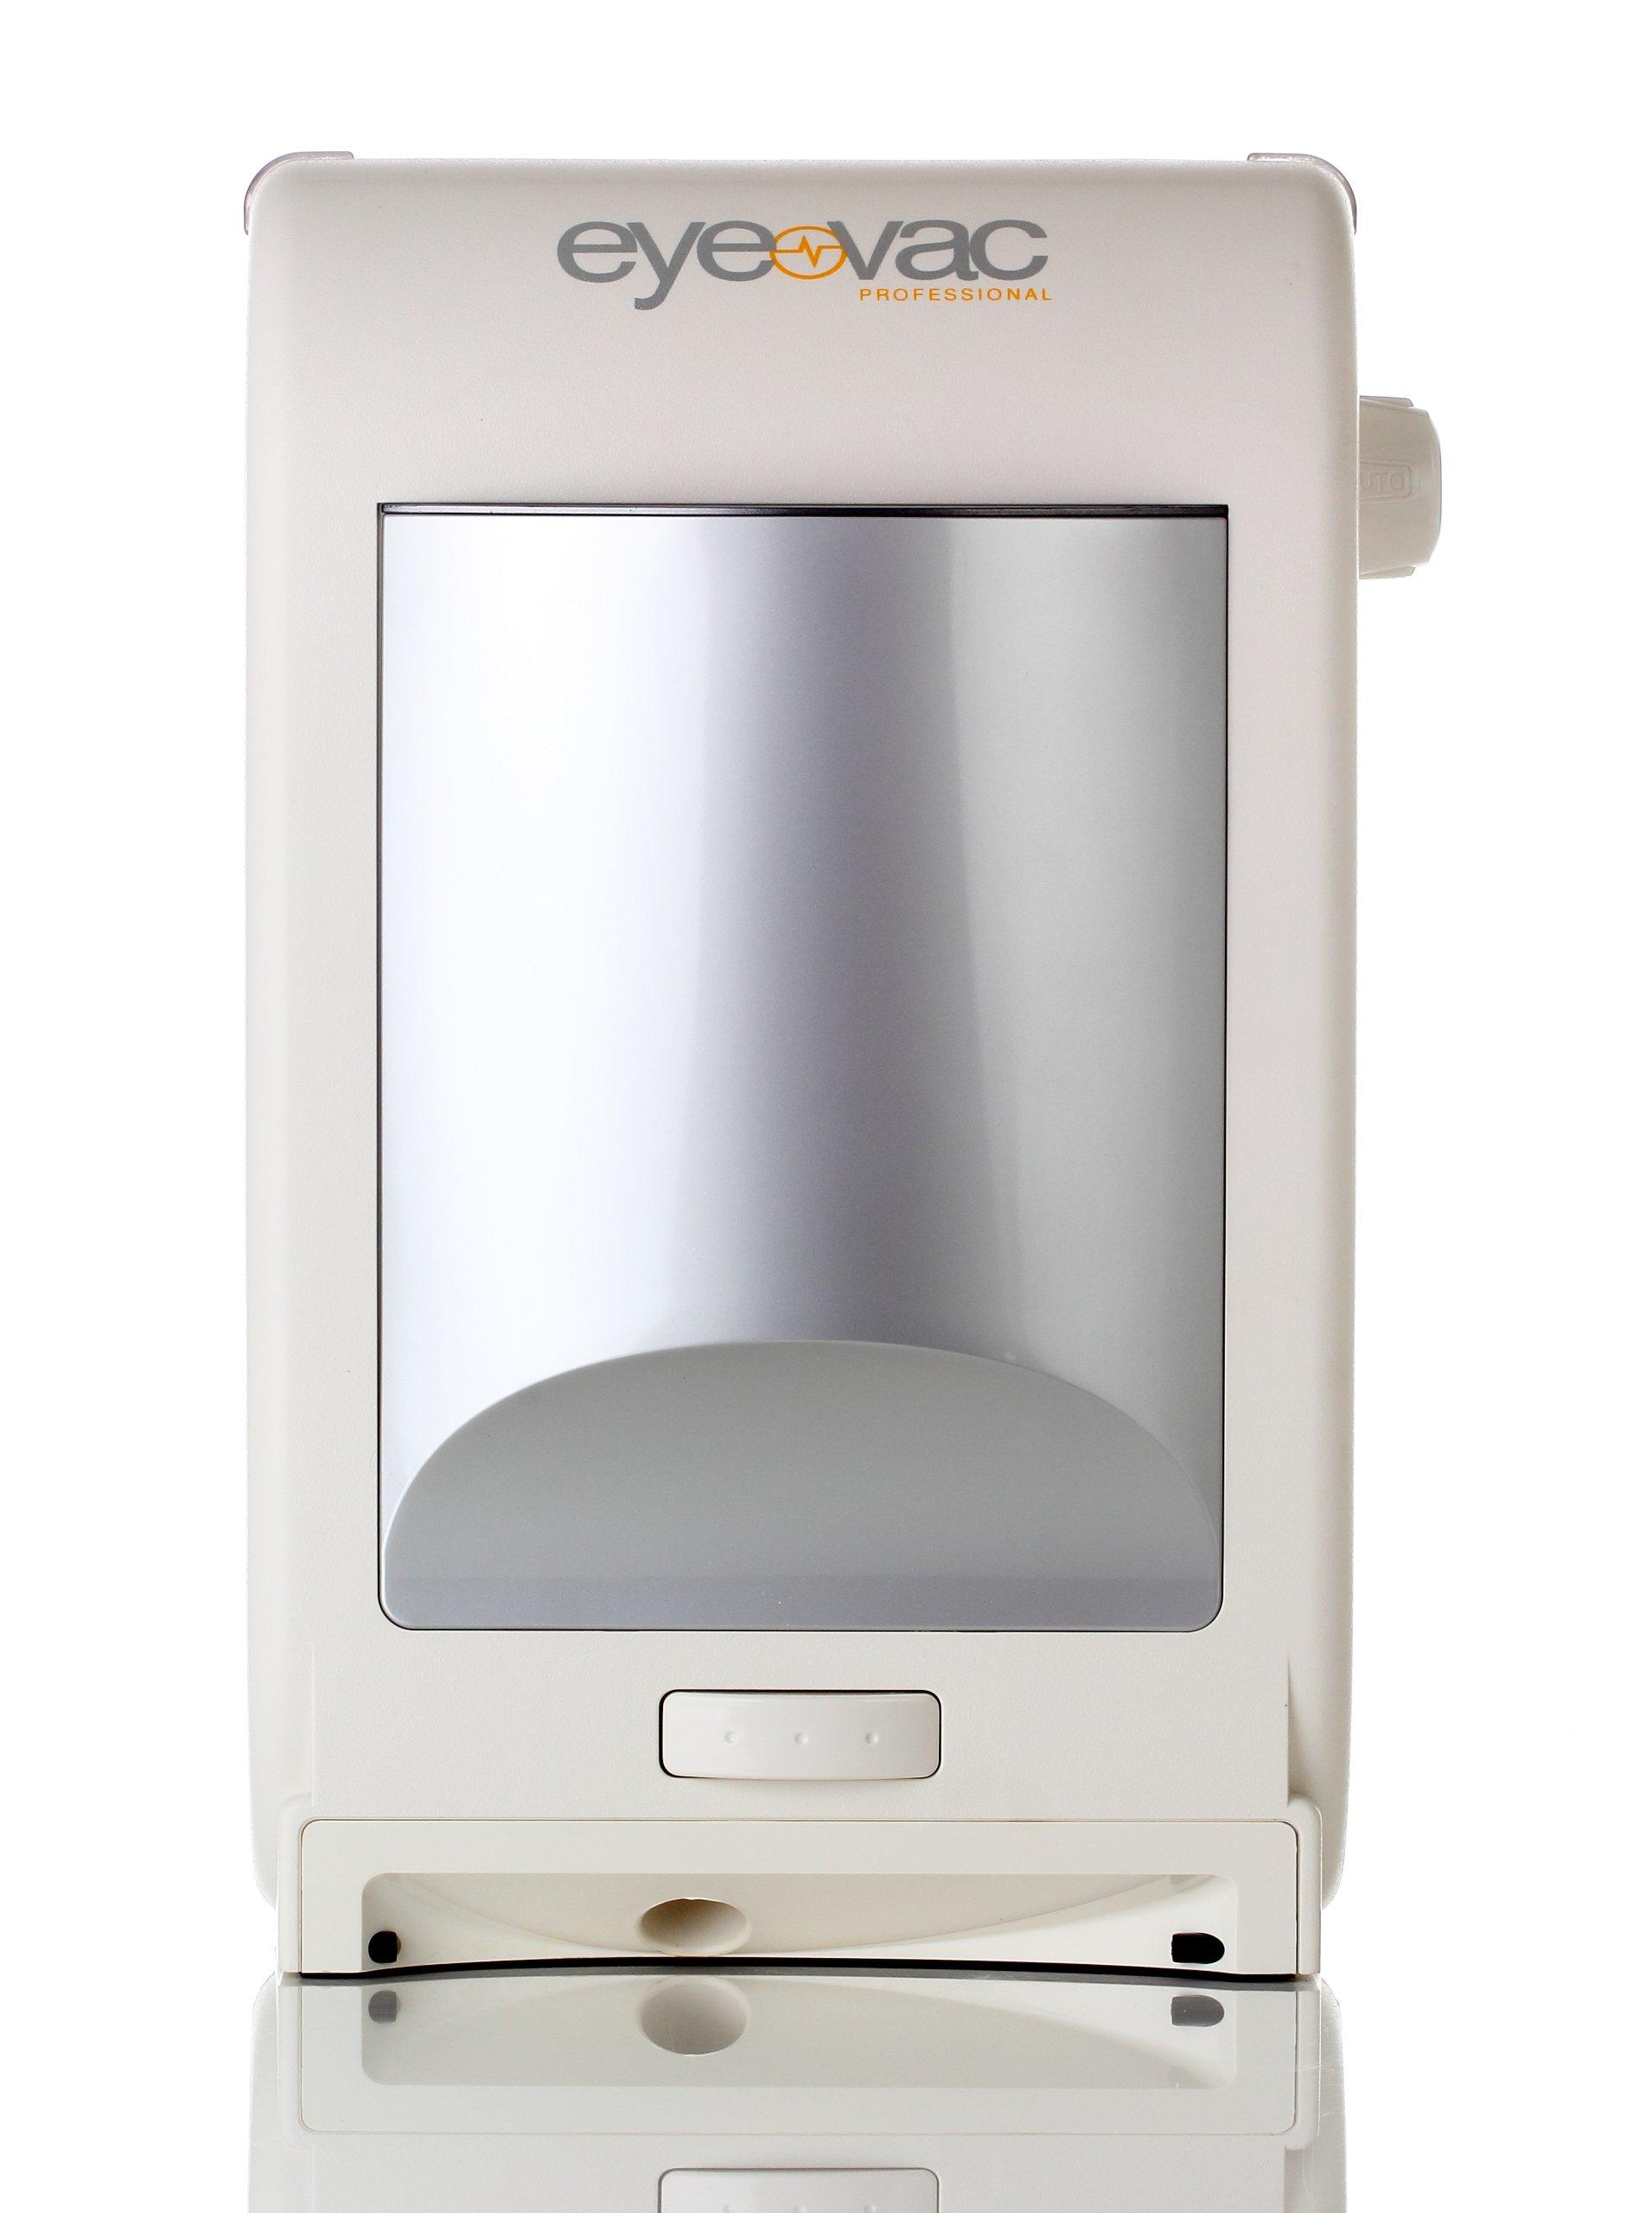 CrowleyJones EVPRO-W Eye-Vac Professional Vacuum Cleaner, Designer White - Corded